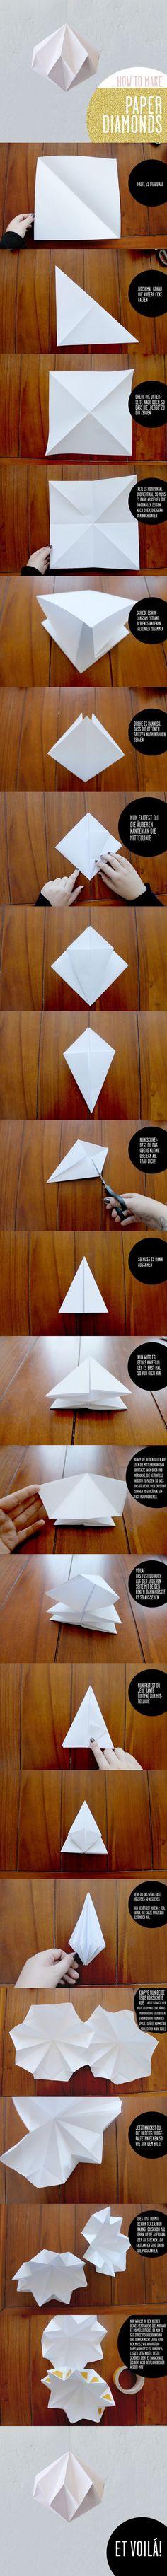 Diamant en origami ann-meer.blogspot.com (Diy Bracelets) #OrigamiLamp